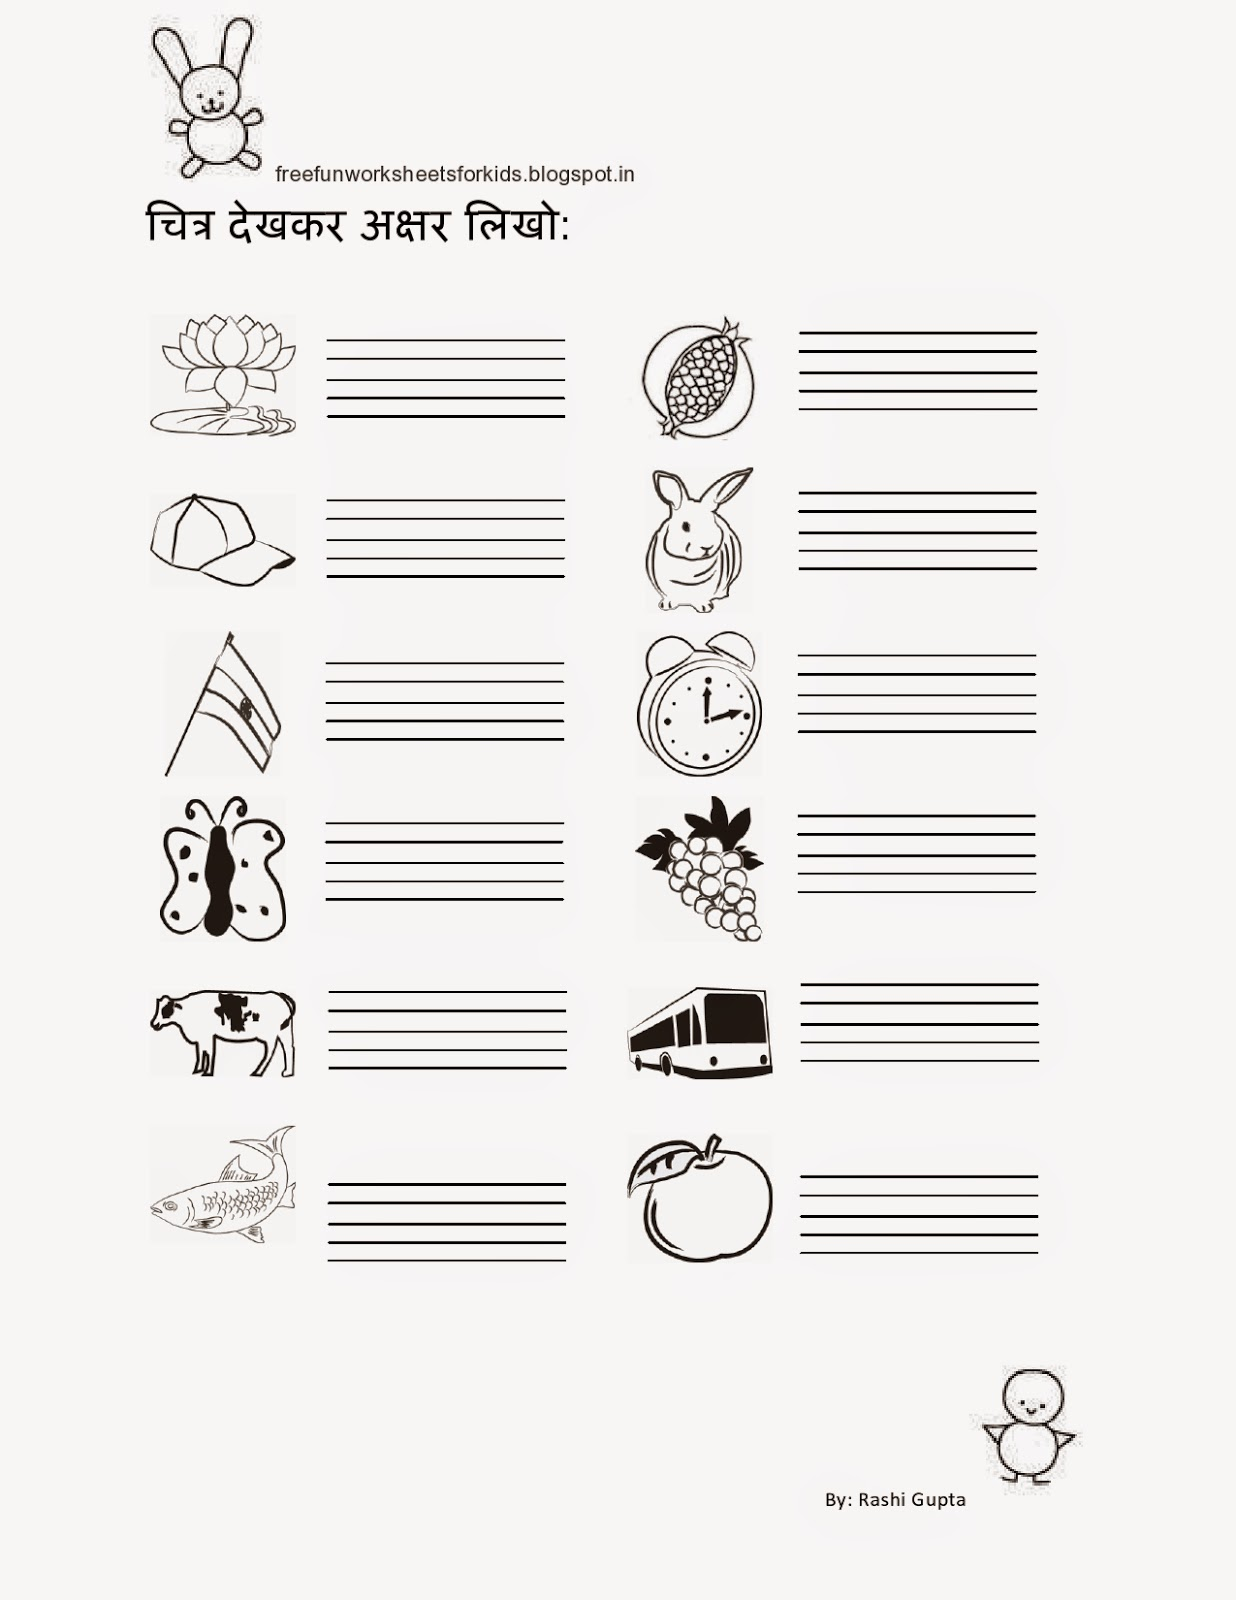 medium resolution of Free Fun Worksheets For Kids: Free Printable Fun Hindi Worksheets for Class  KG - चित्र देखकर अक्षर लिखो